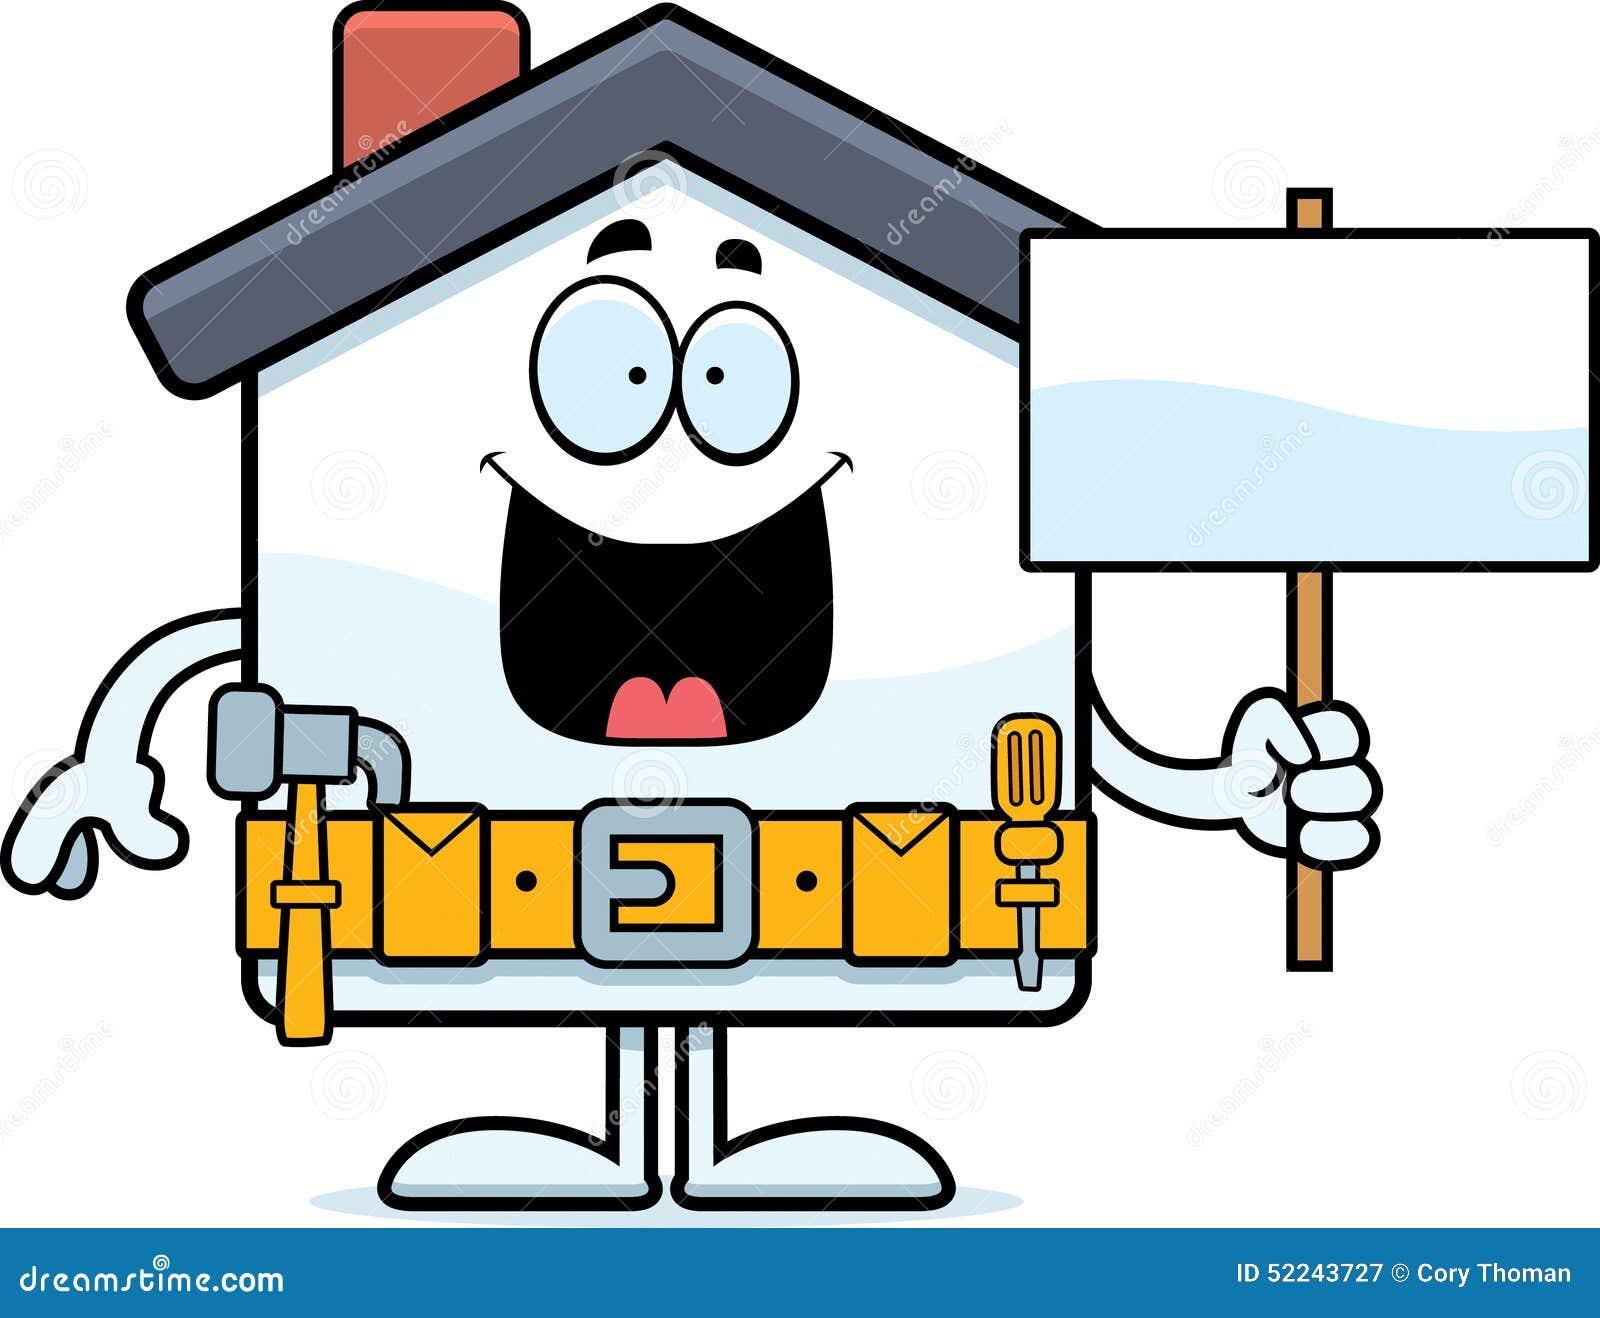 Cartoon Home Improvement Sign Stock Vector - Image: 52243727